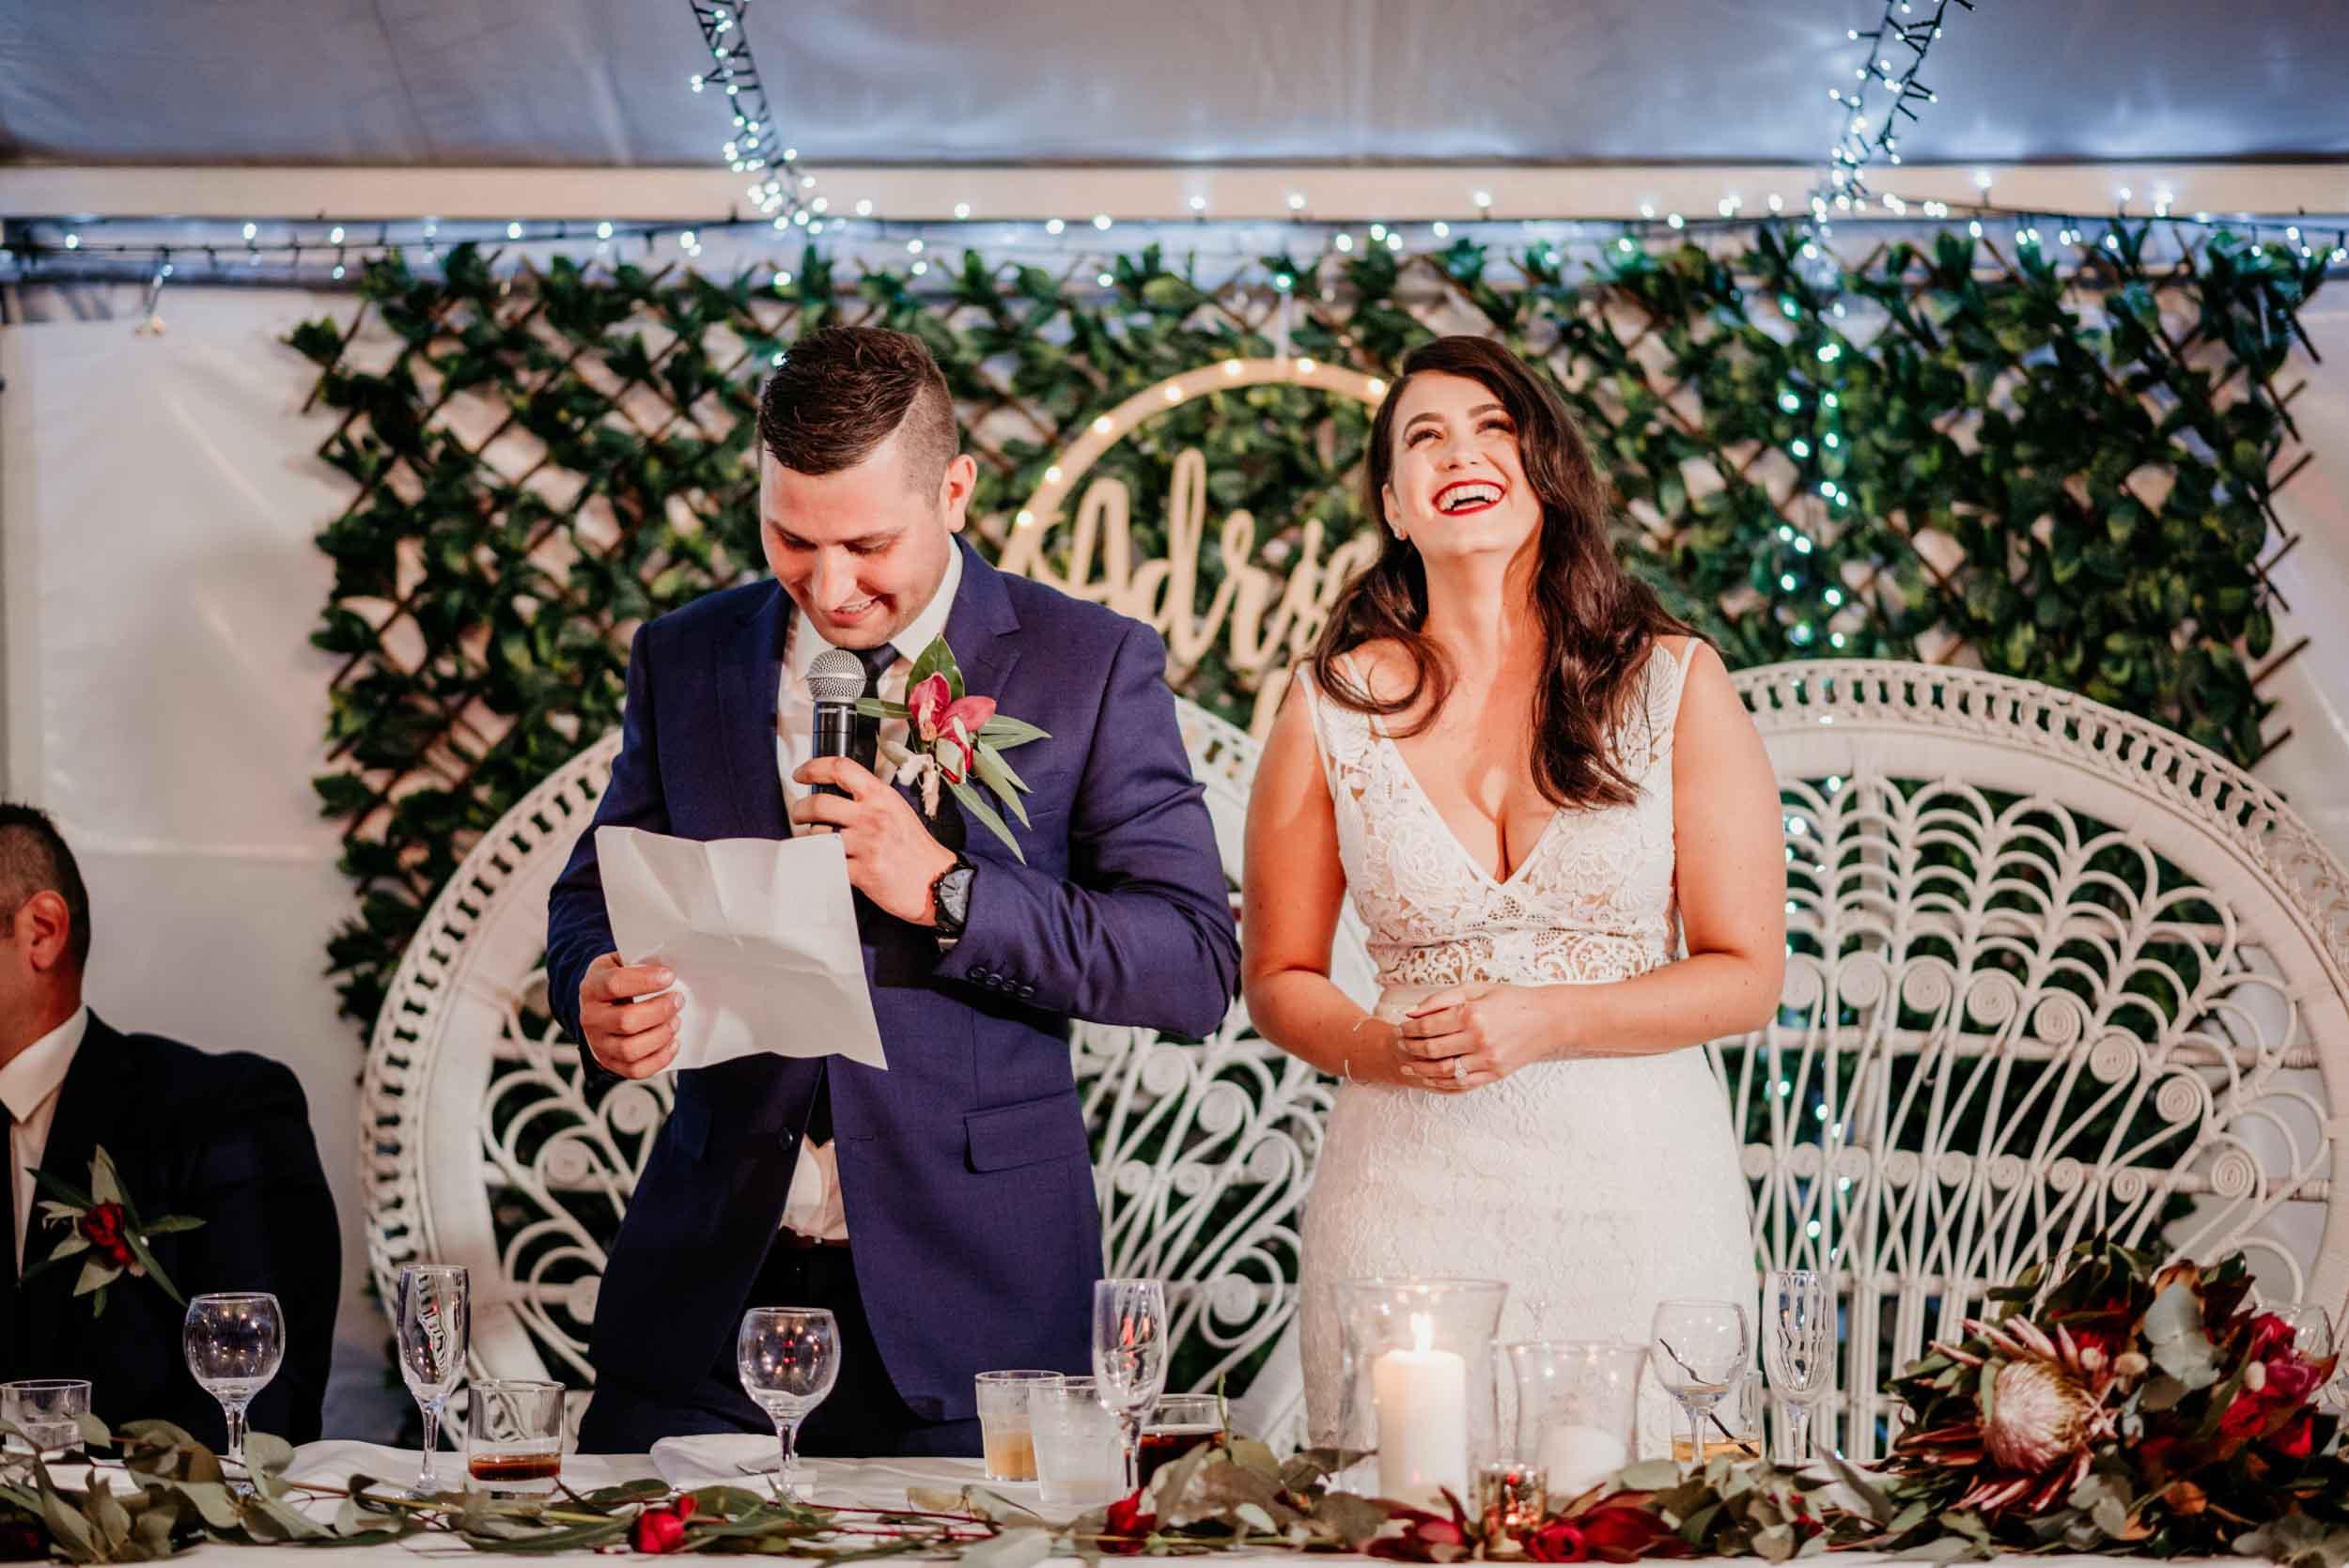 The Raw Photographer - Cairns Wedding Photographer - Atherton Tablelands - Mareeba farm Wedding - Irene Costa's Devine Bridal - Candid - Photo Package-58.jpg